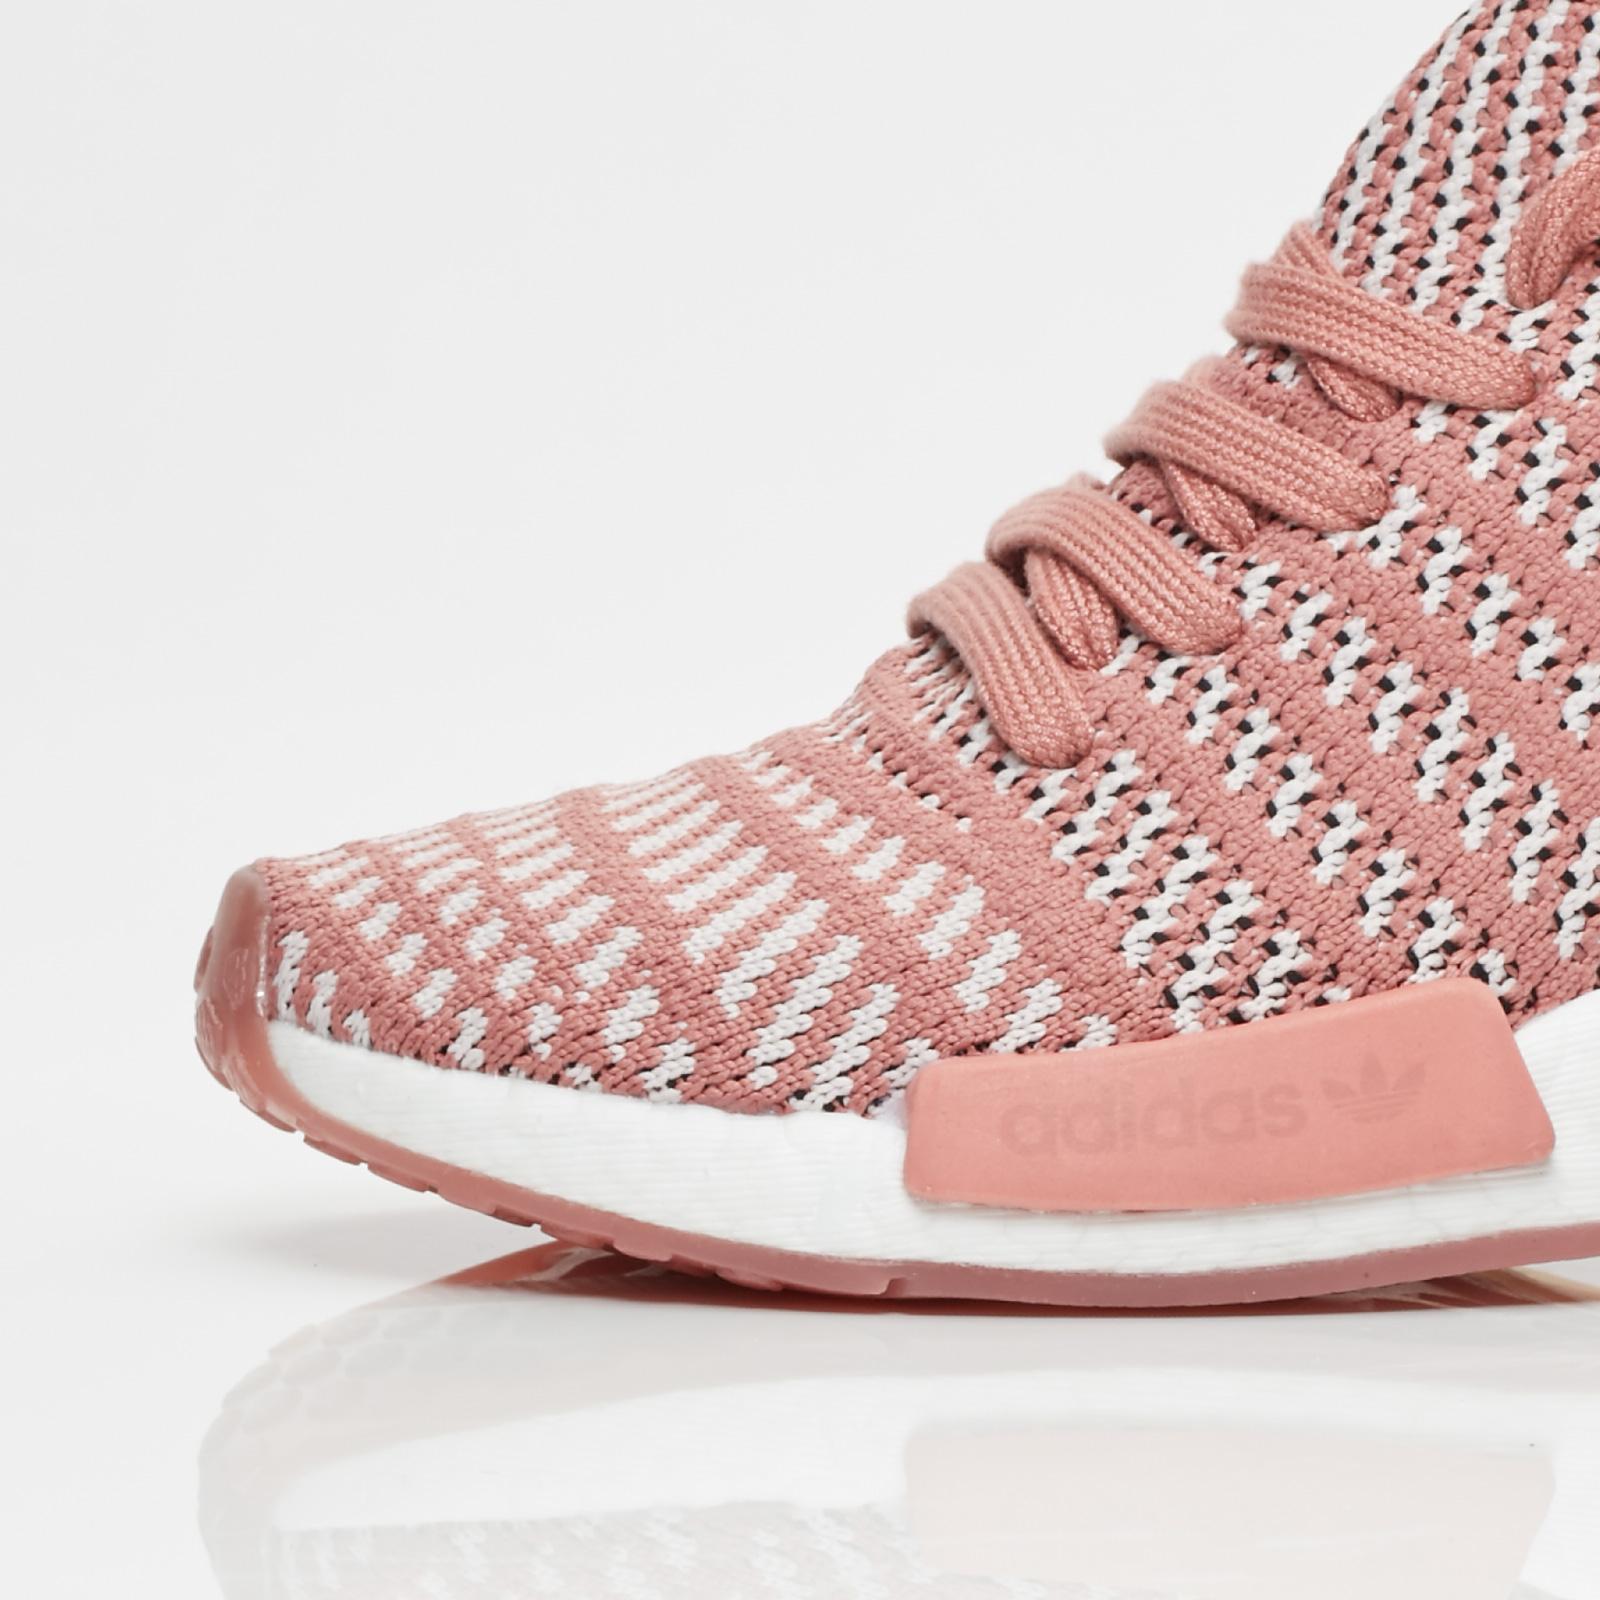 size 40 c84b1 ffc30 adidas Originals NMD R1 STLT Primeknit Womens - 6. Close